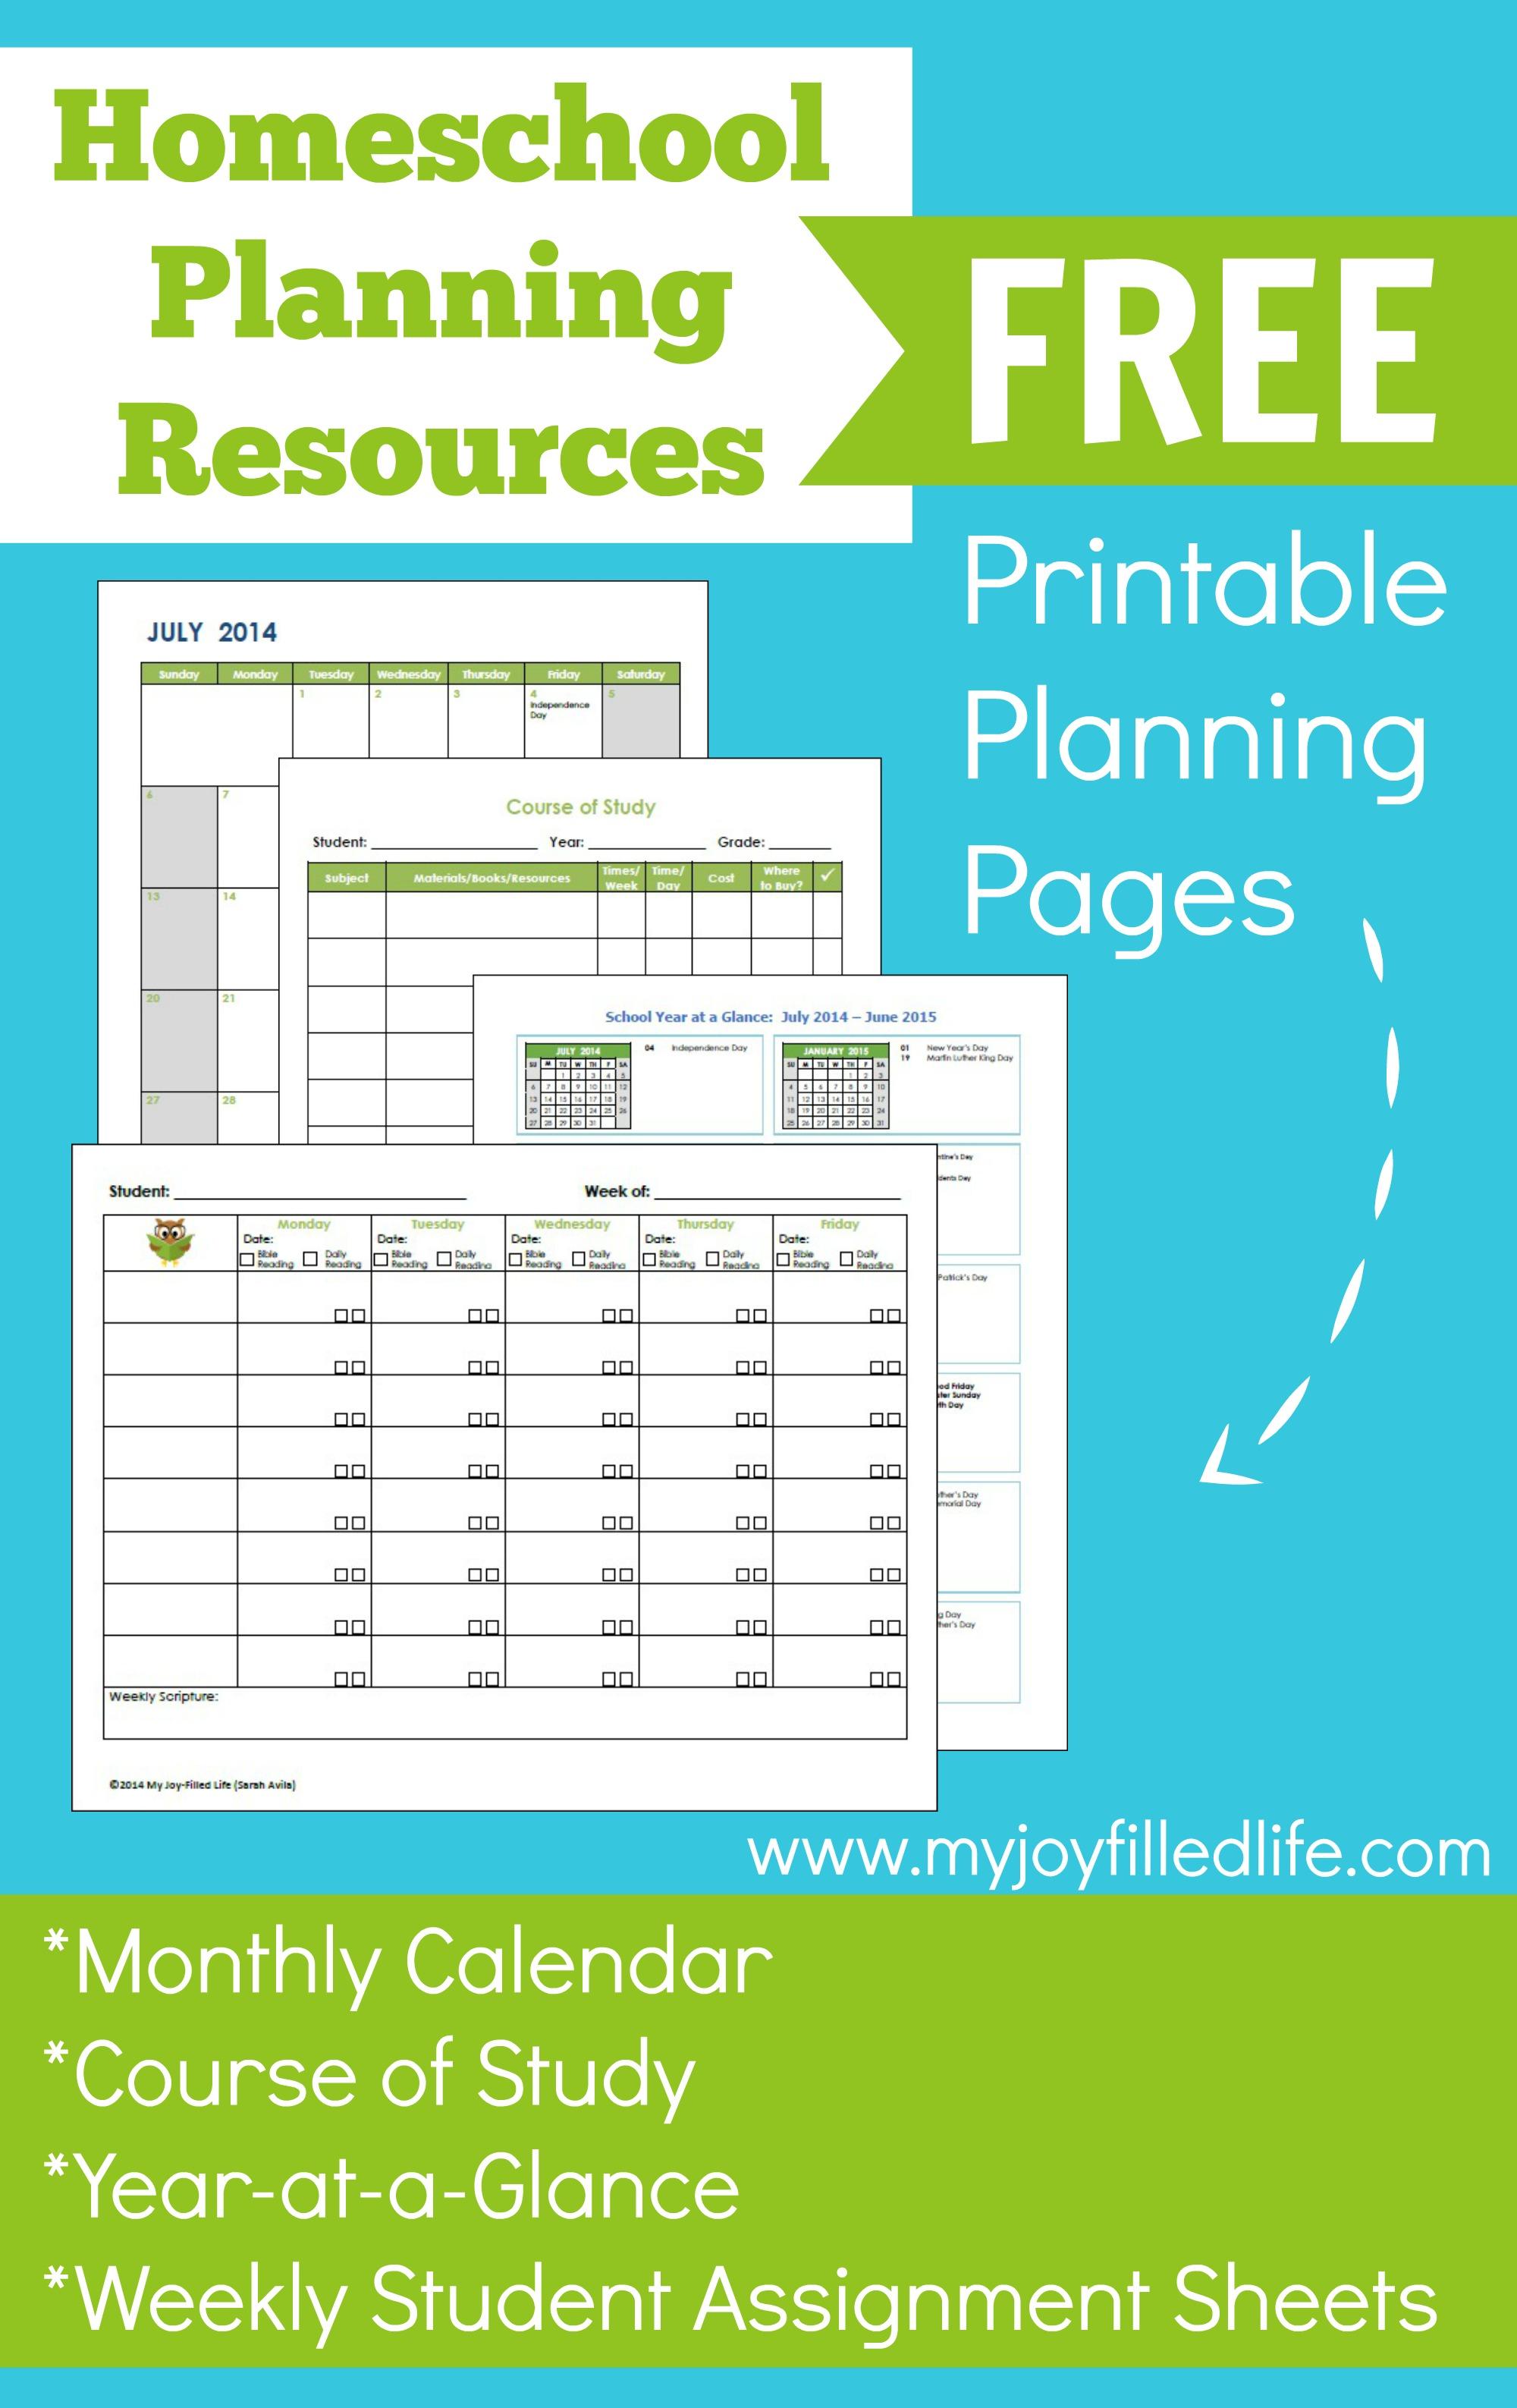 7 Images of Free Printable Homeschool Planner 2014-2015